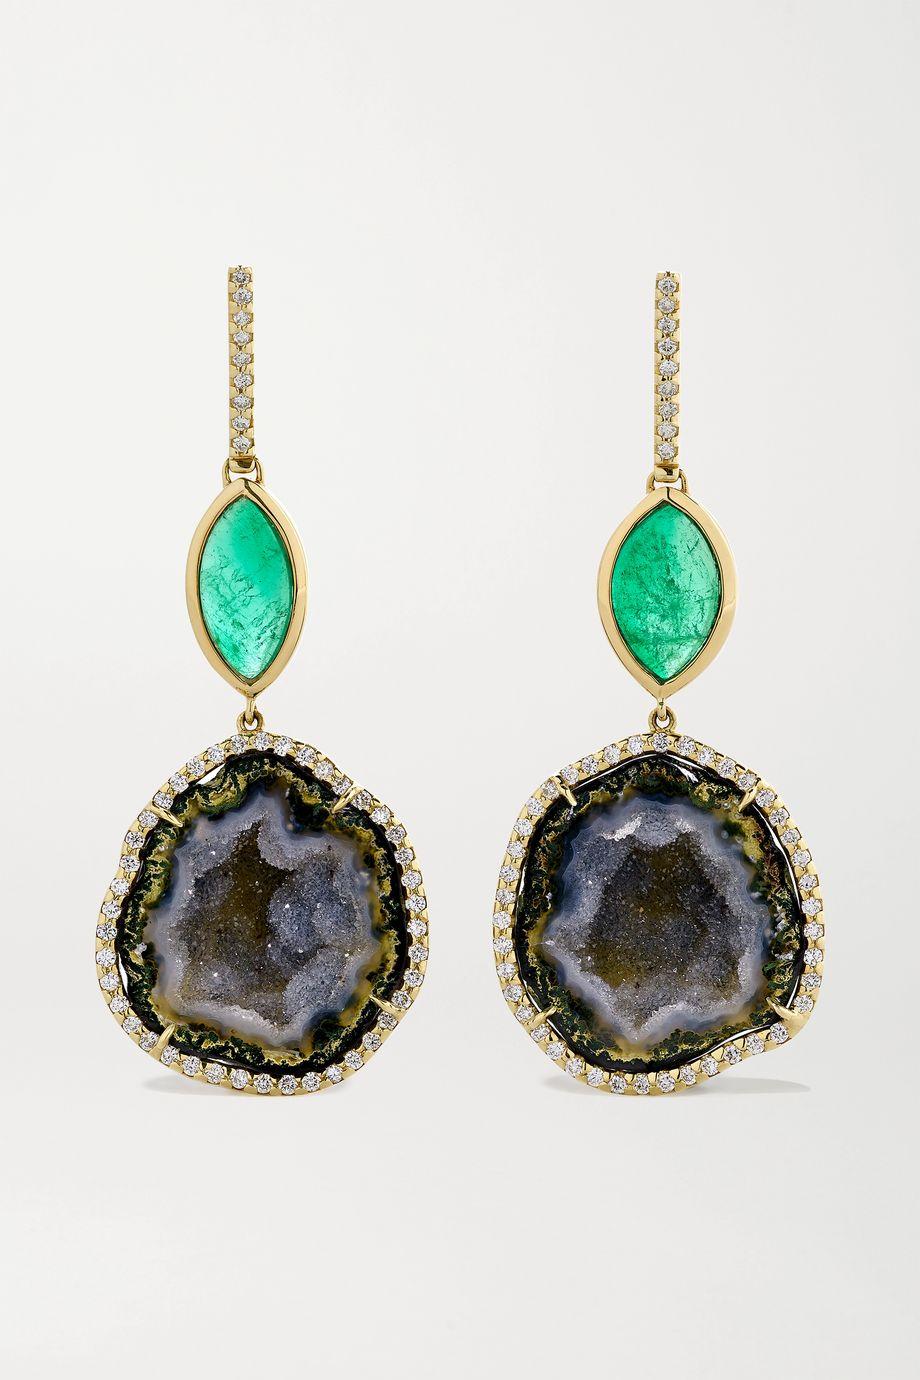 Kimberly McDonald 18-karat green gold, geode, emerald and diamond earrings